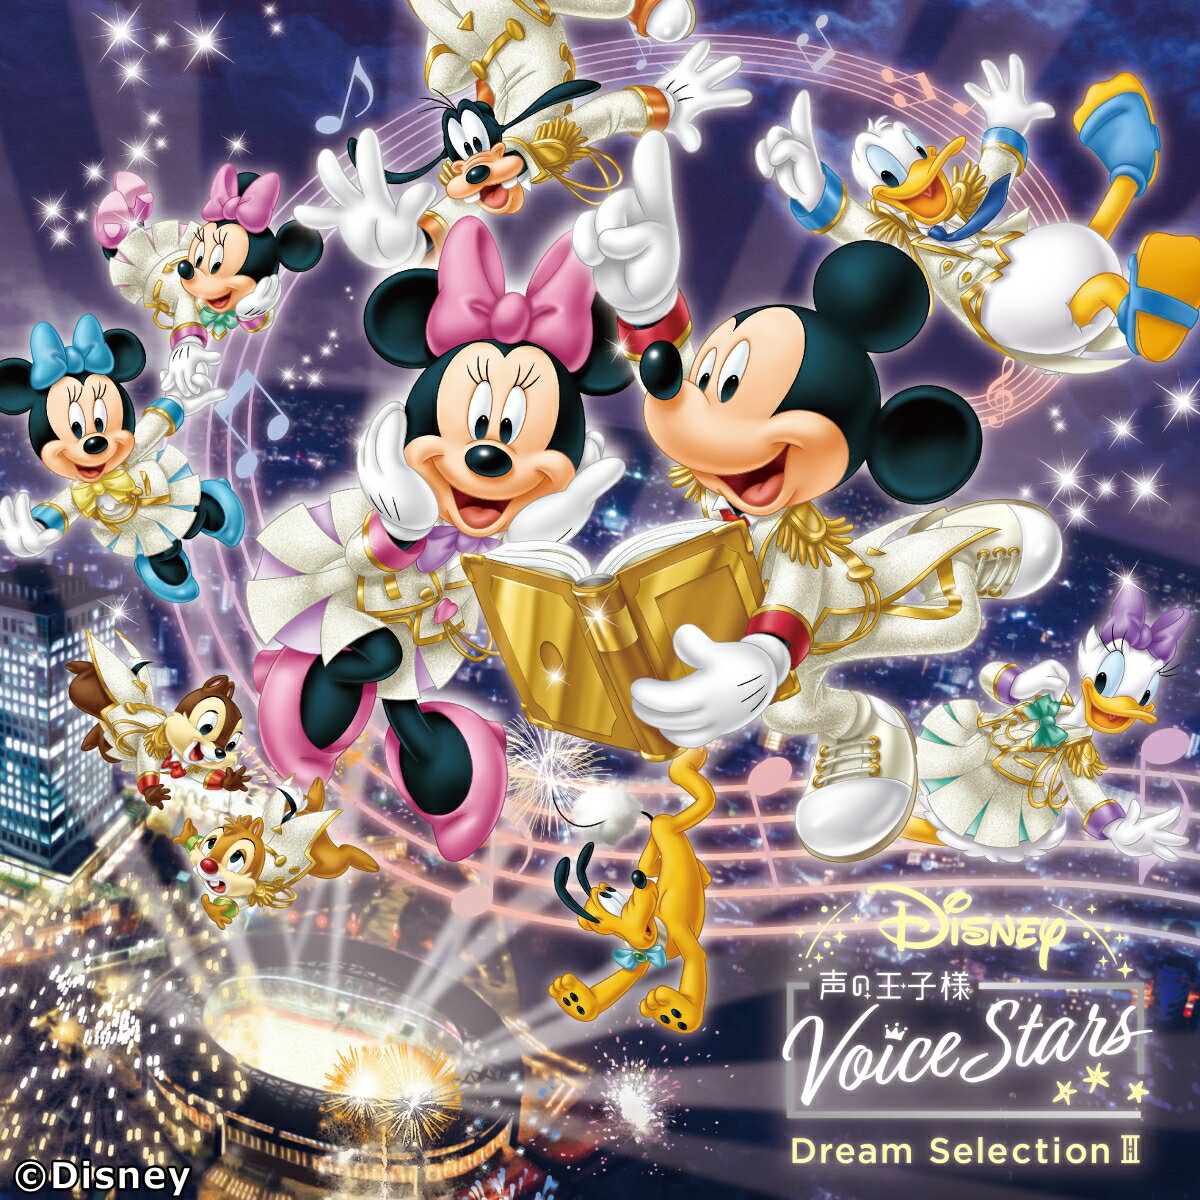 Disney 声の王子様 Voice Stars Dream Selection 3画像